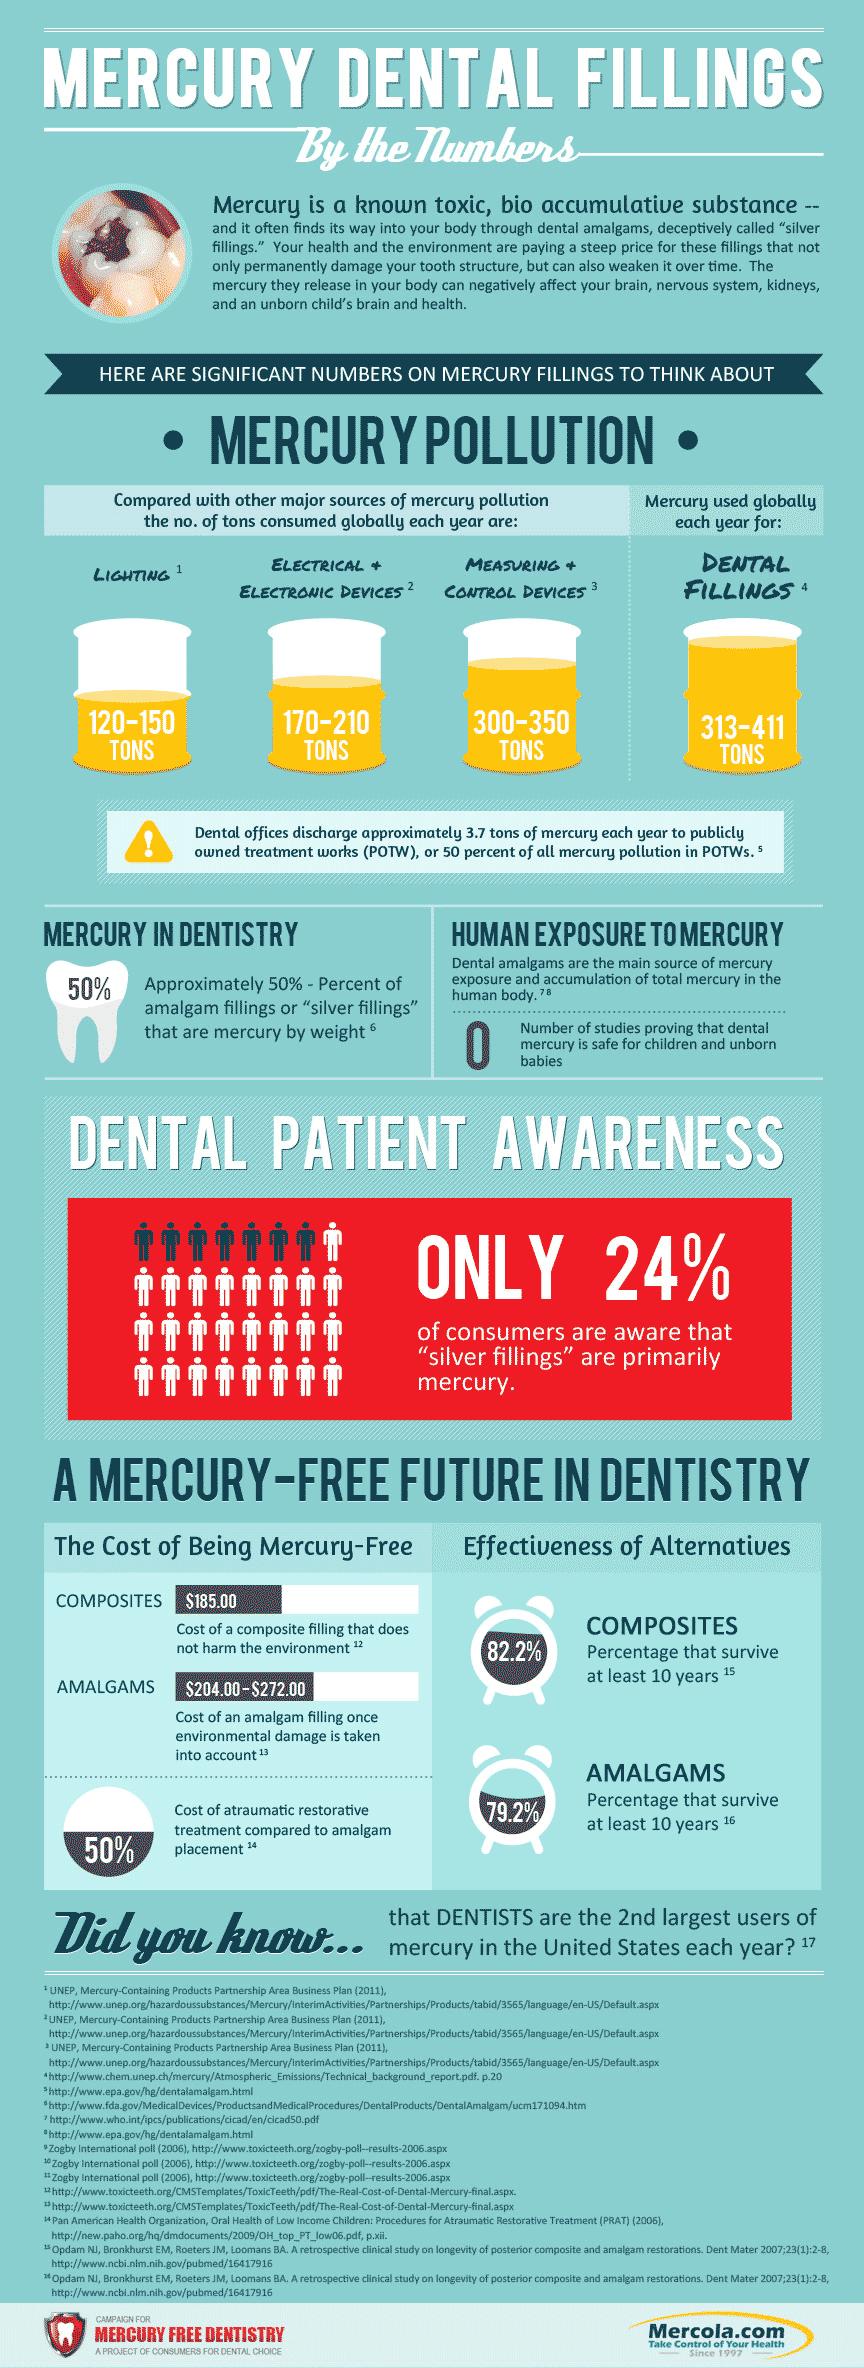 The Dangers of Mercury Fillings ~ https://healthpositiveinfo.com/mercury-fillings.html